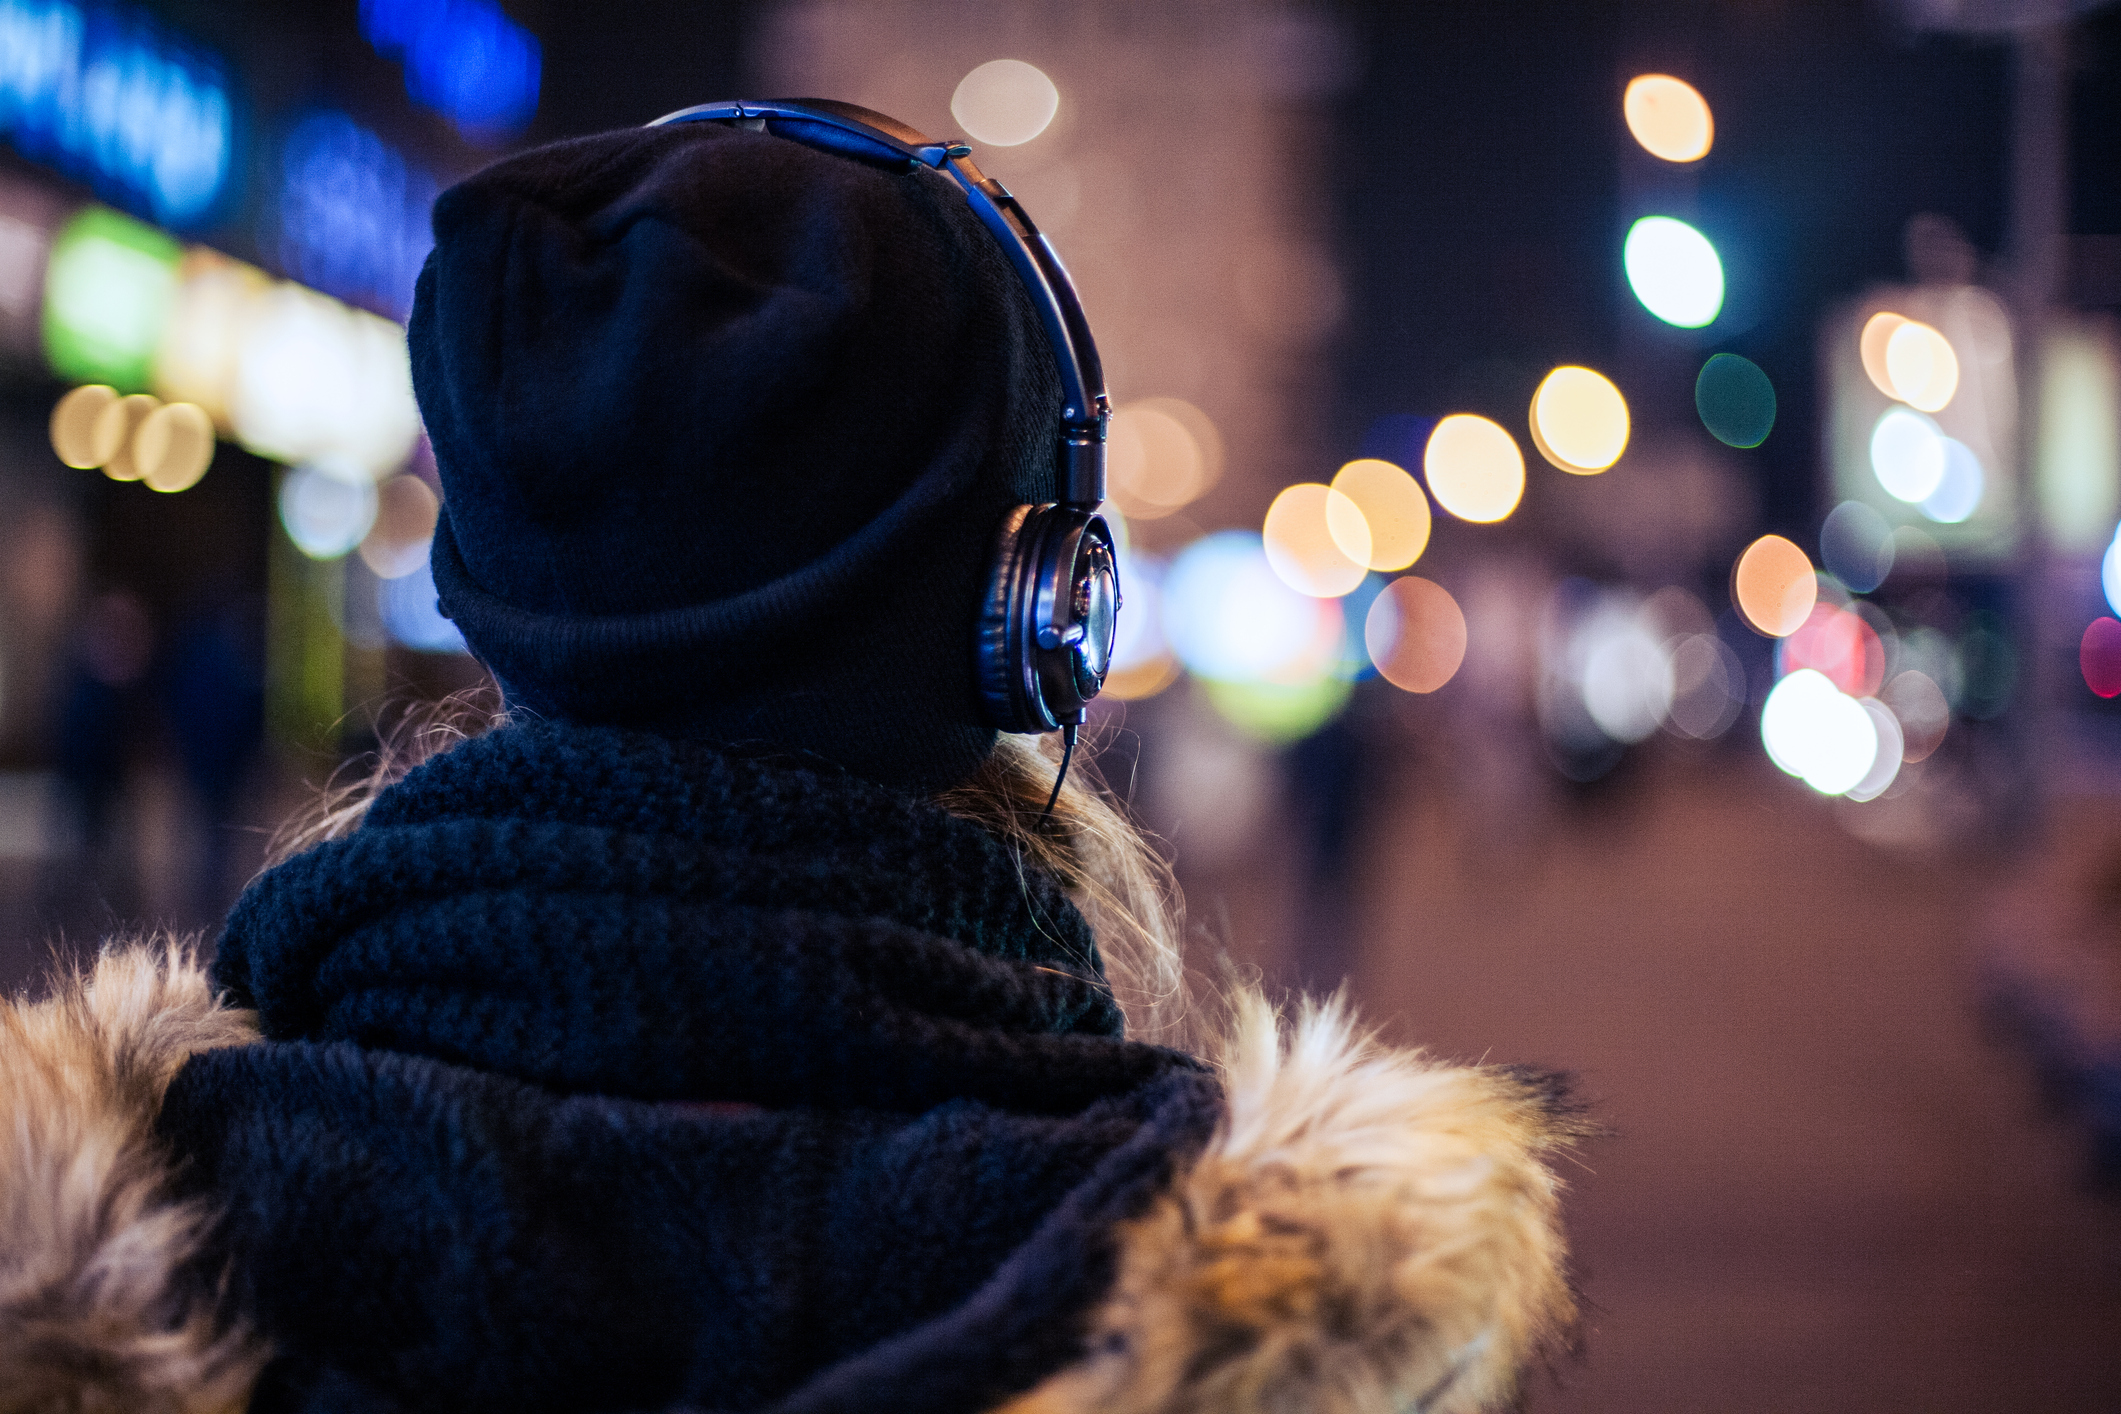 Girl walking through night city street listening to the music